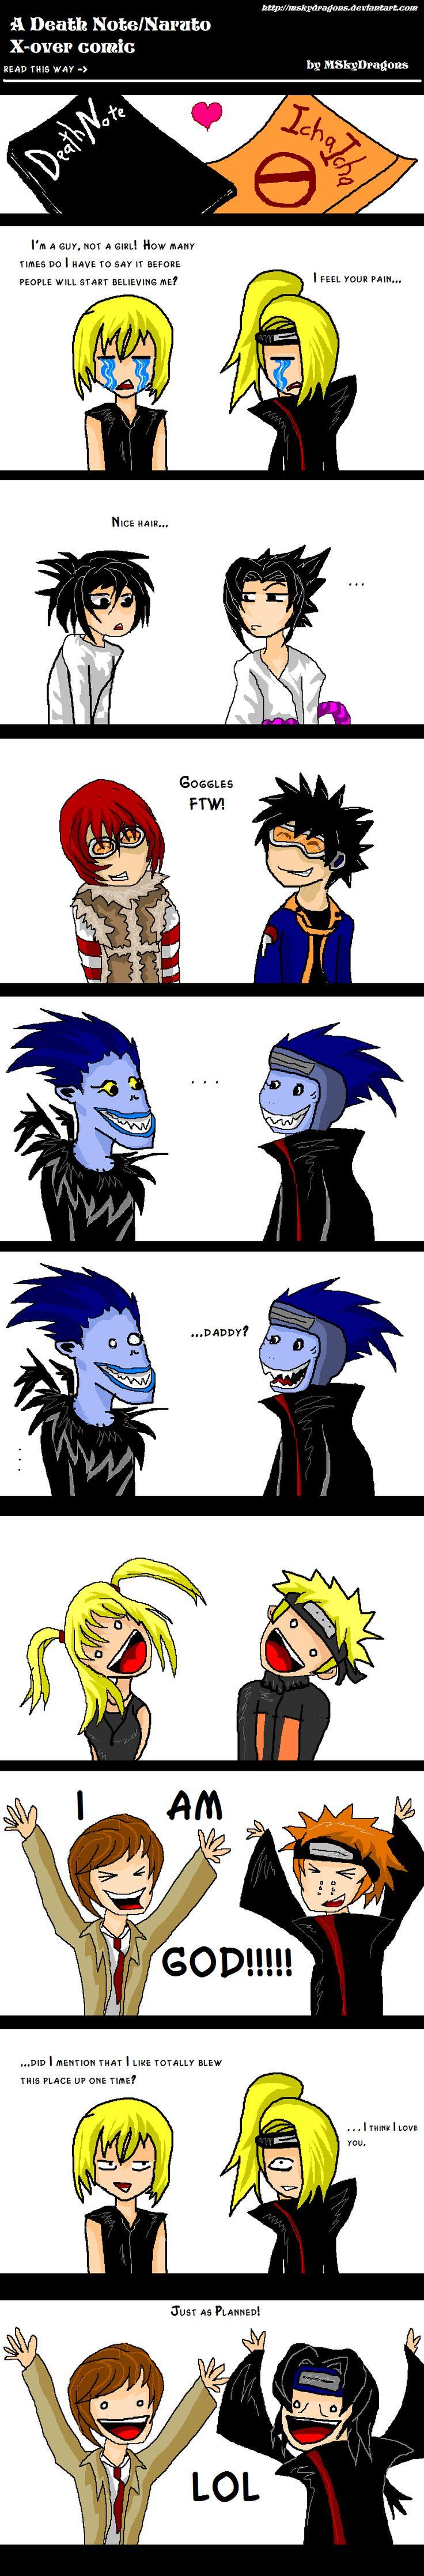 Naruto + Death Note CrackComic by MSkyDragons.deviantart.com